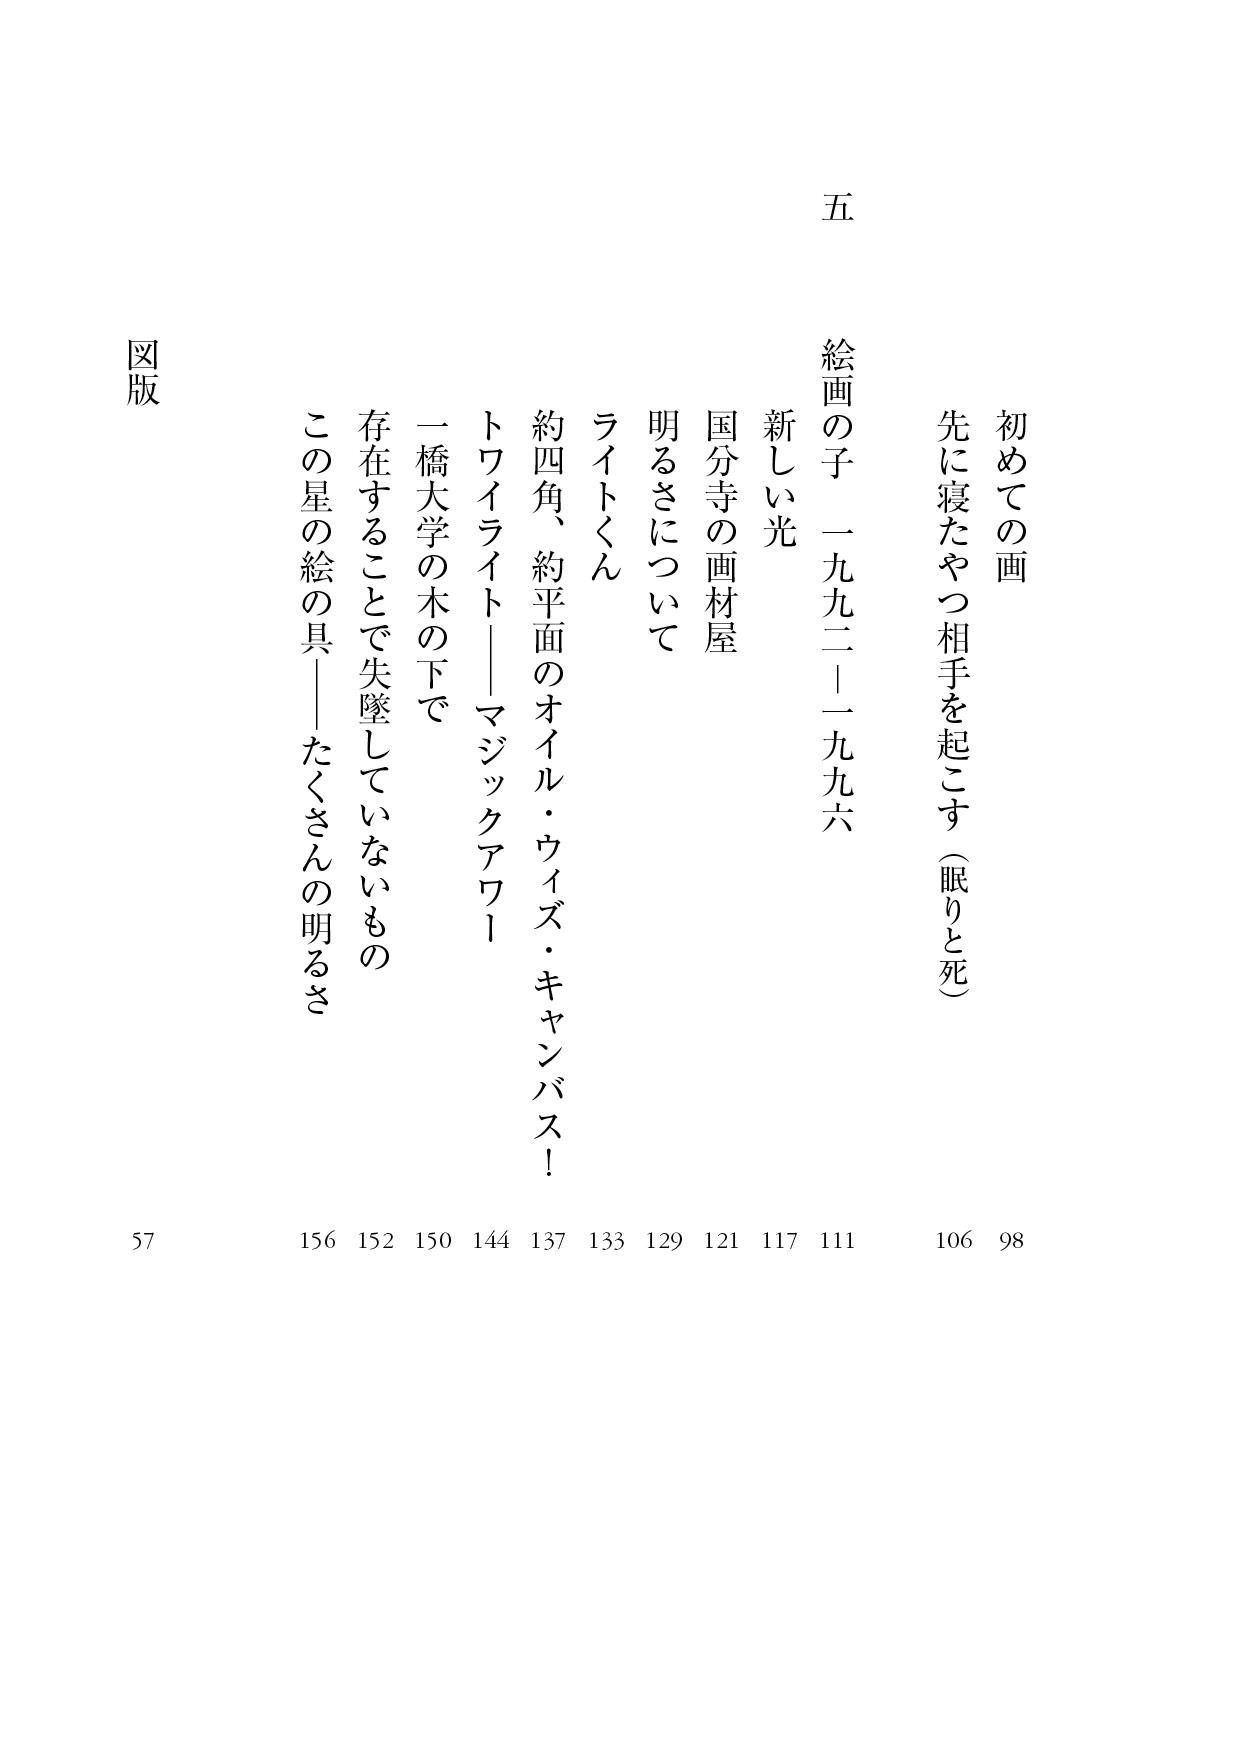 AB0015